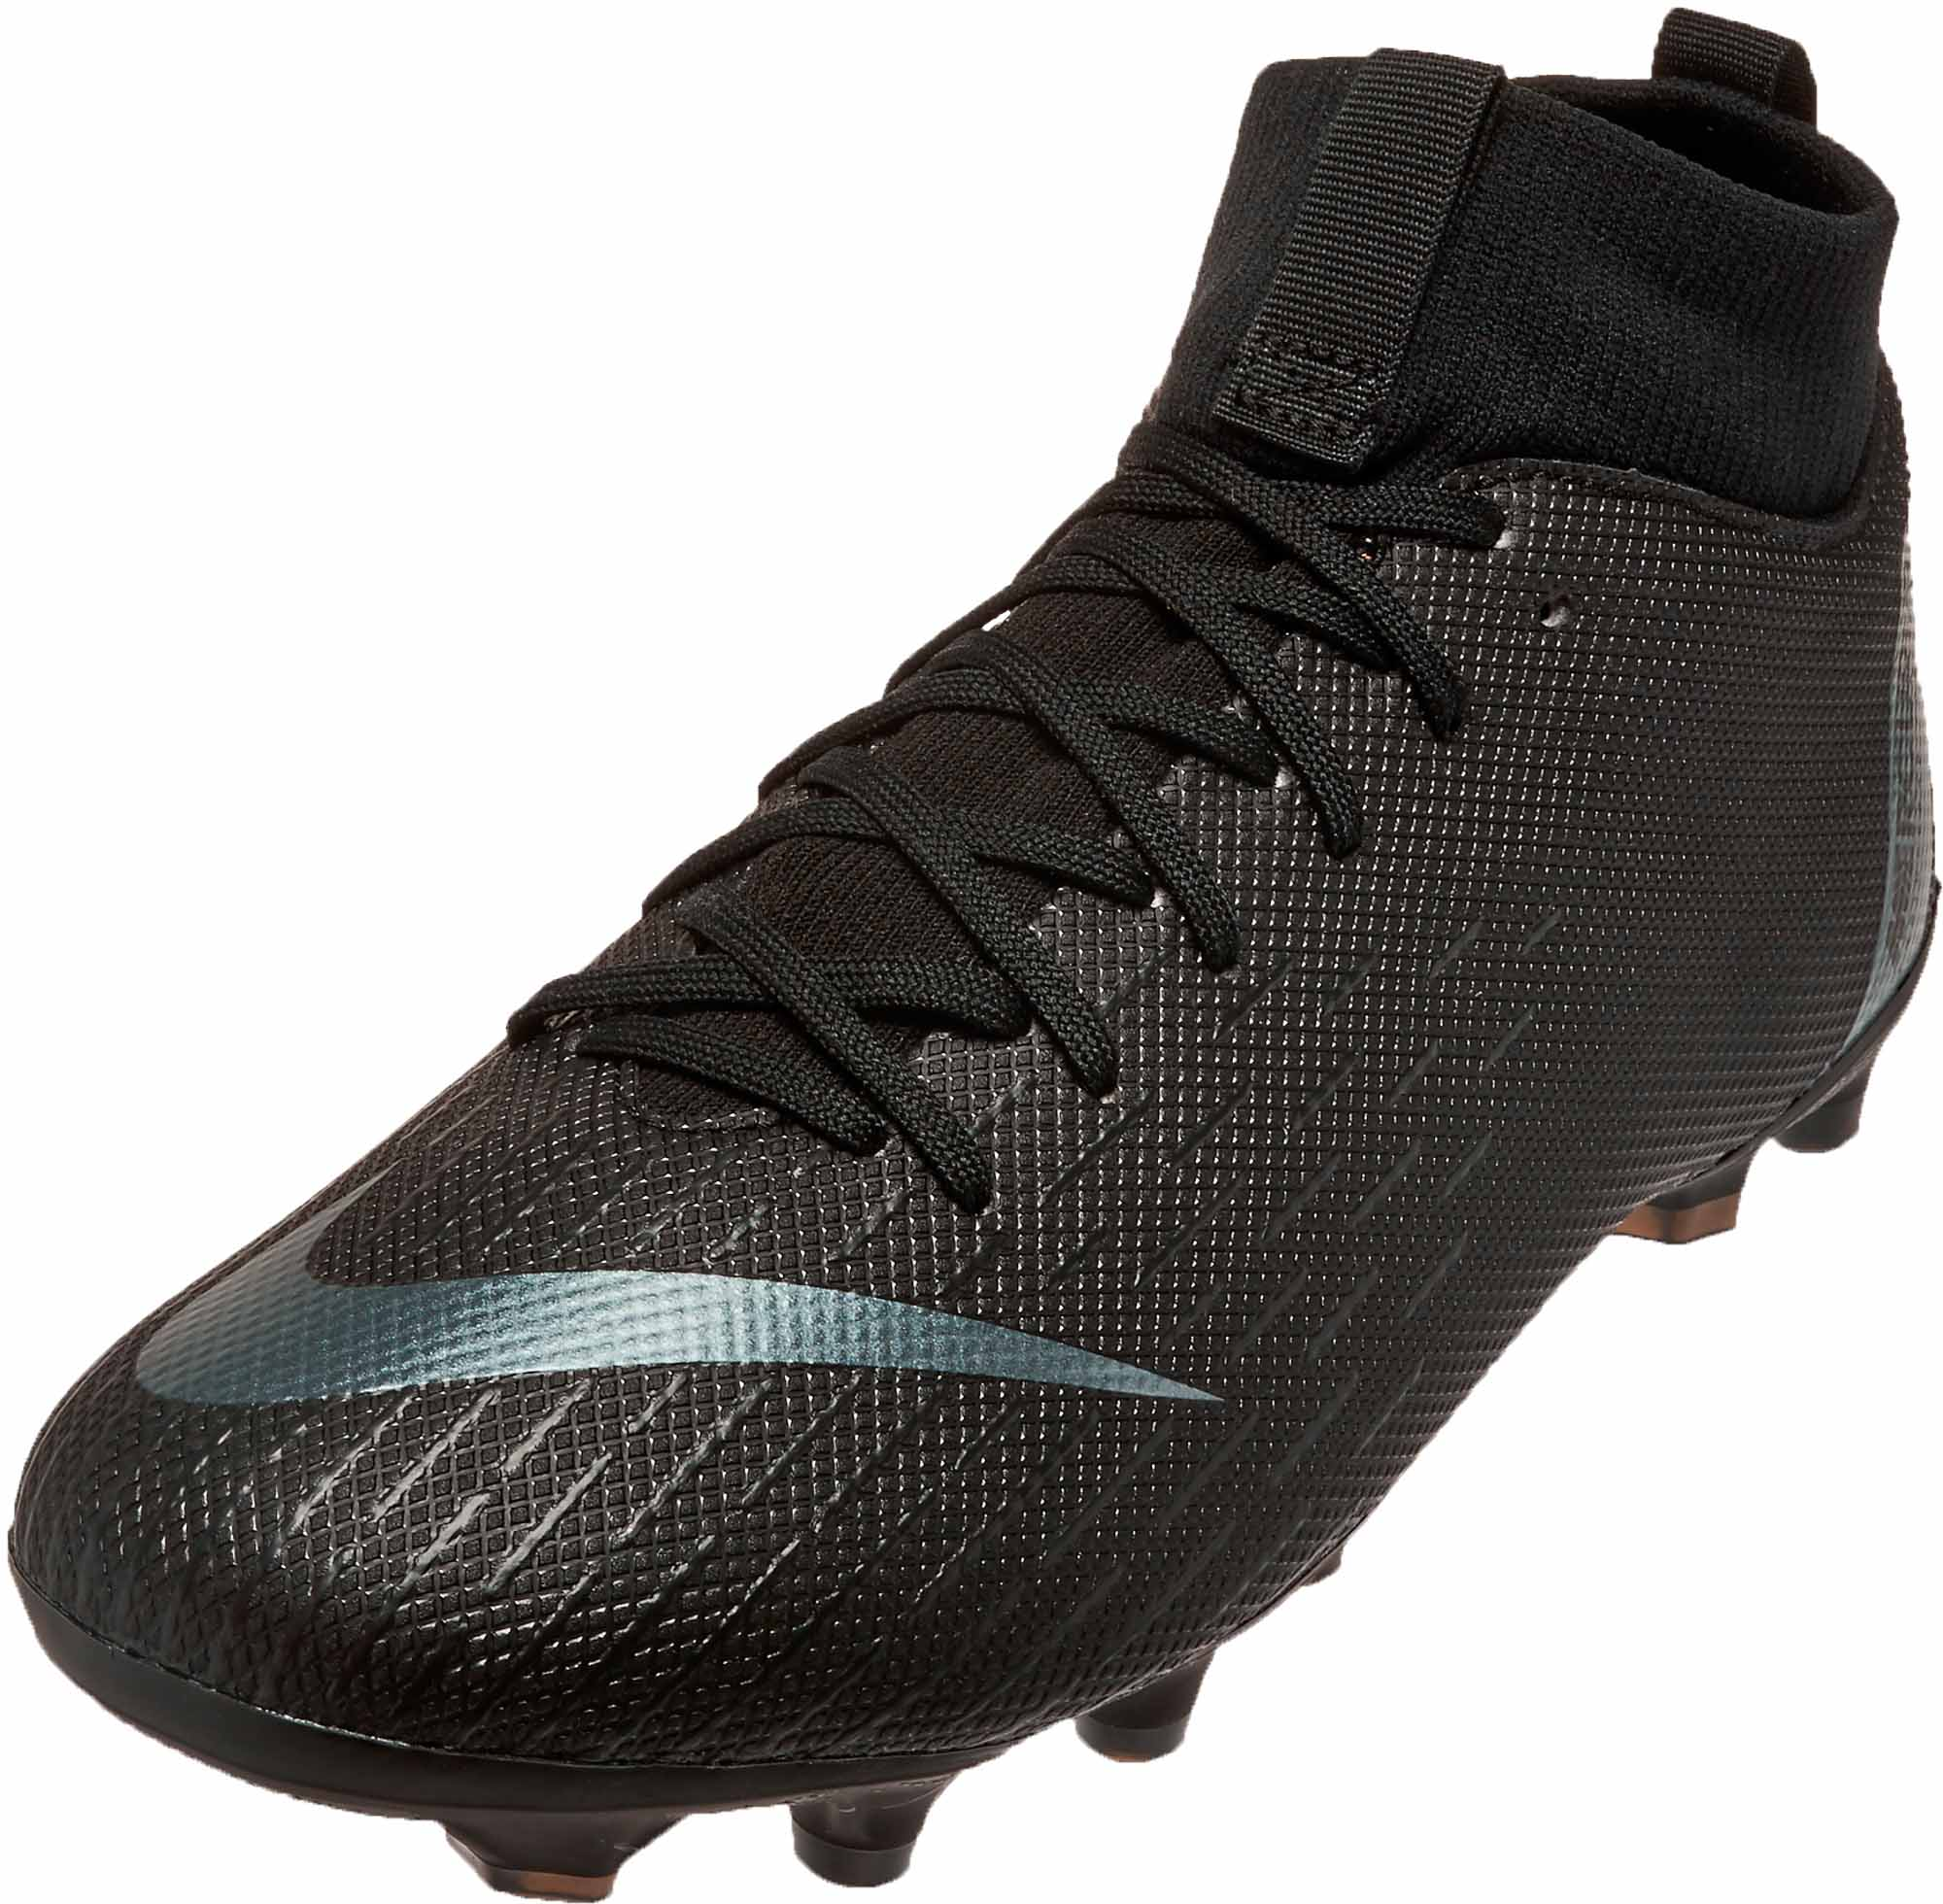 48153a23dec16 Nike Mercurial Superfly 6 Academy MG - Youth - Black/Black - Soccer ...